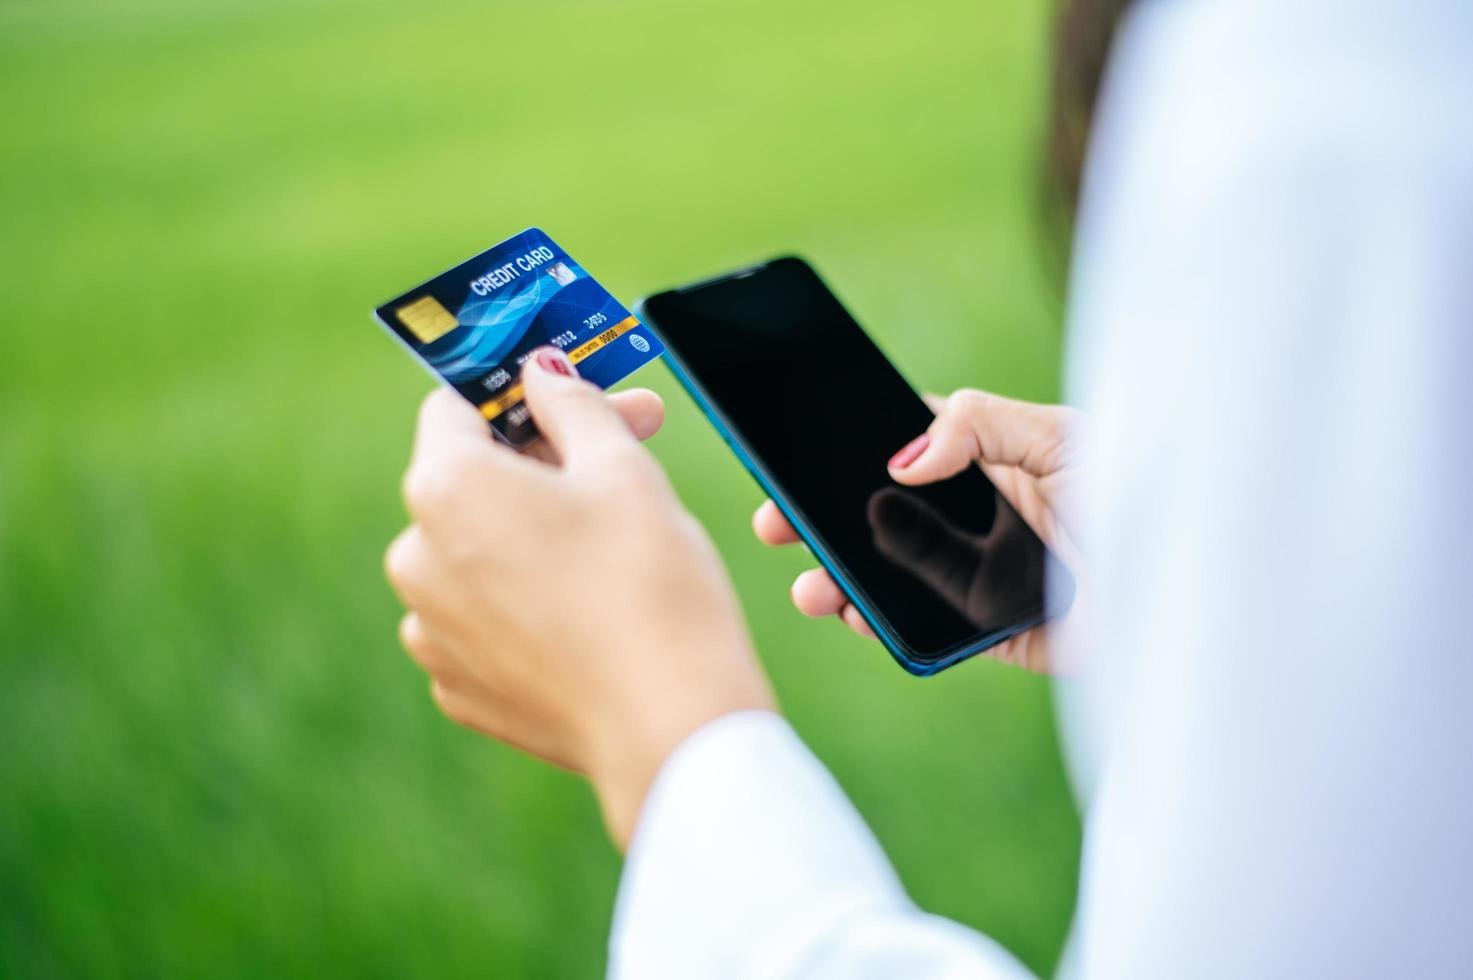 Zahlung für Waren per Kreditkarte per Smartphone foto